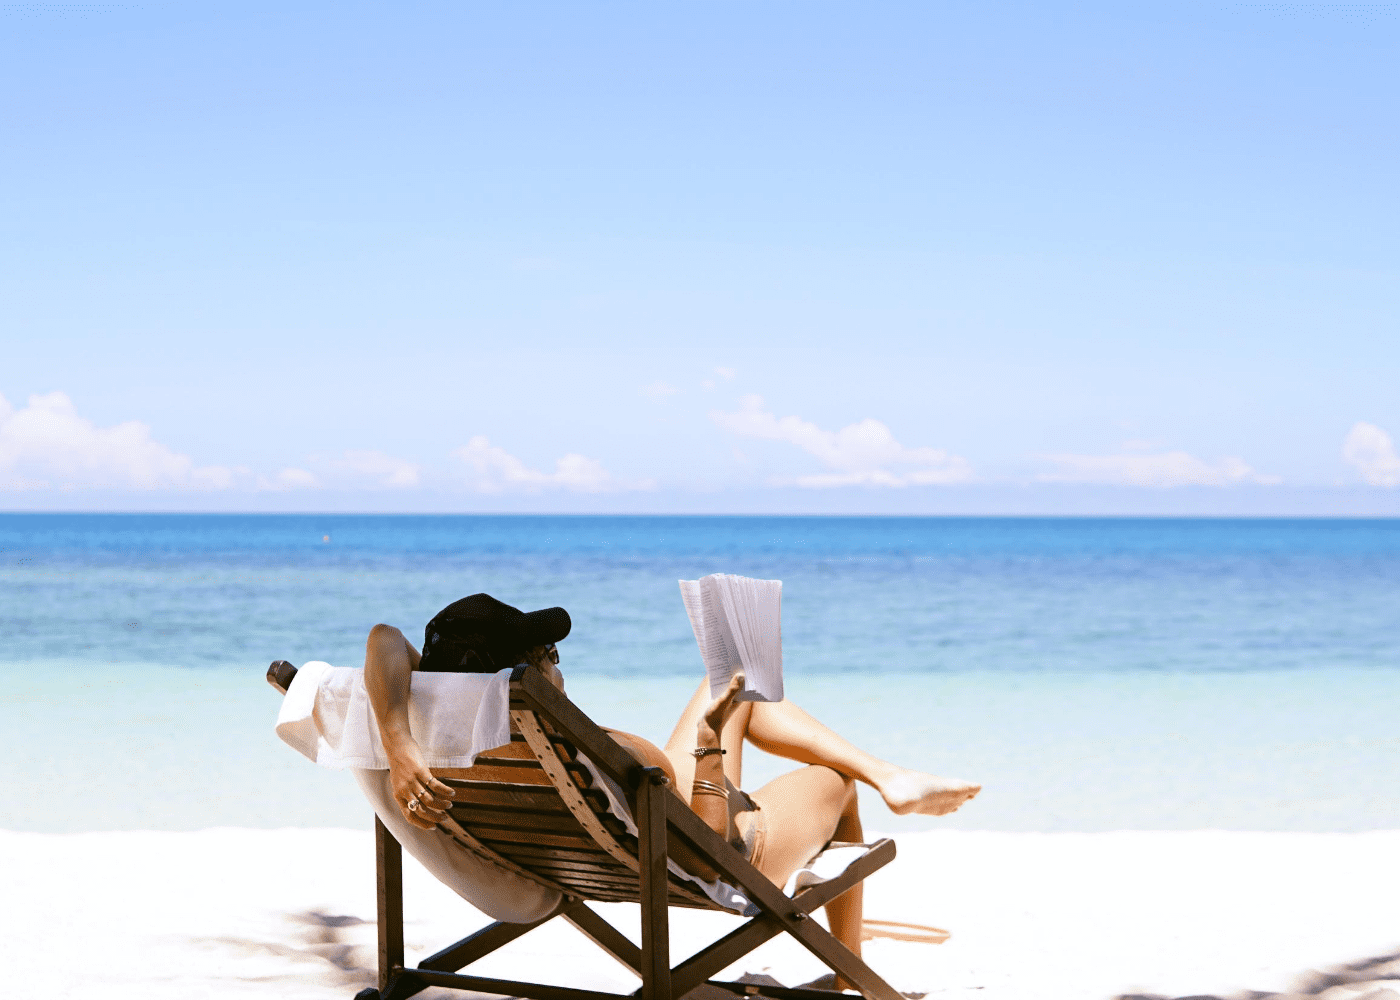 beach vacation | public holidays 2021